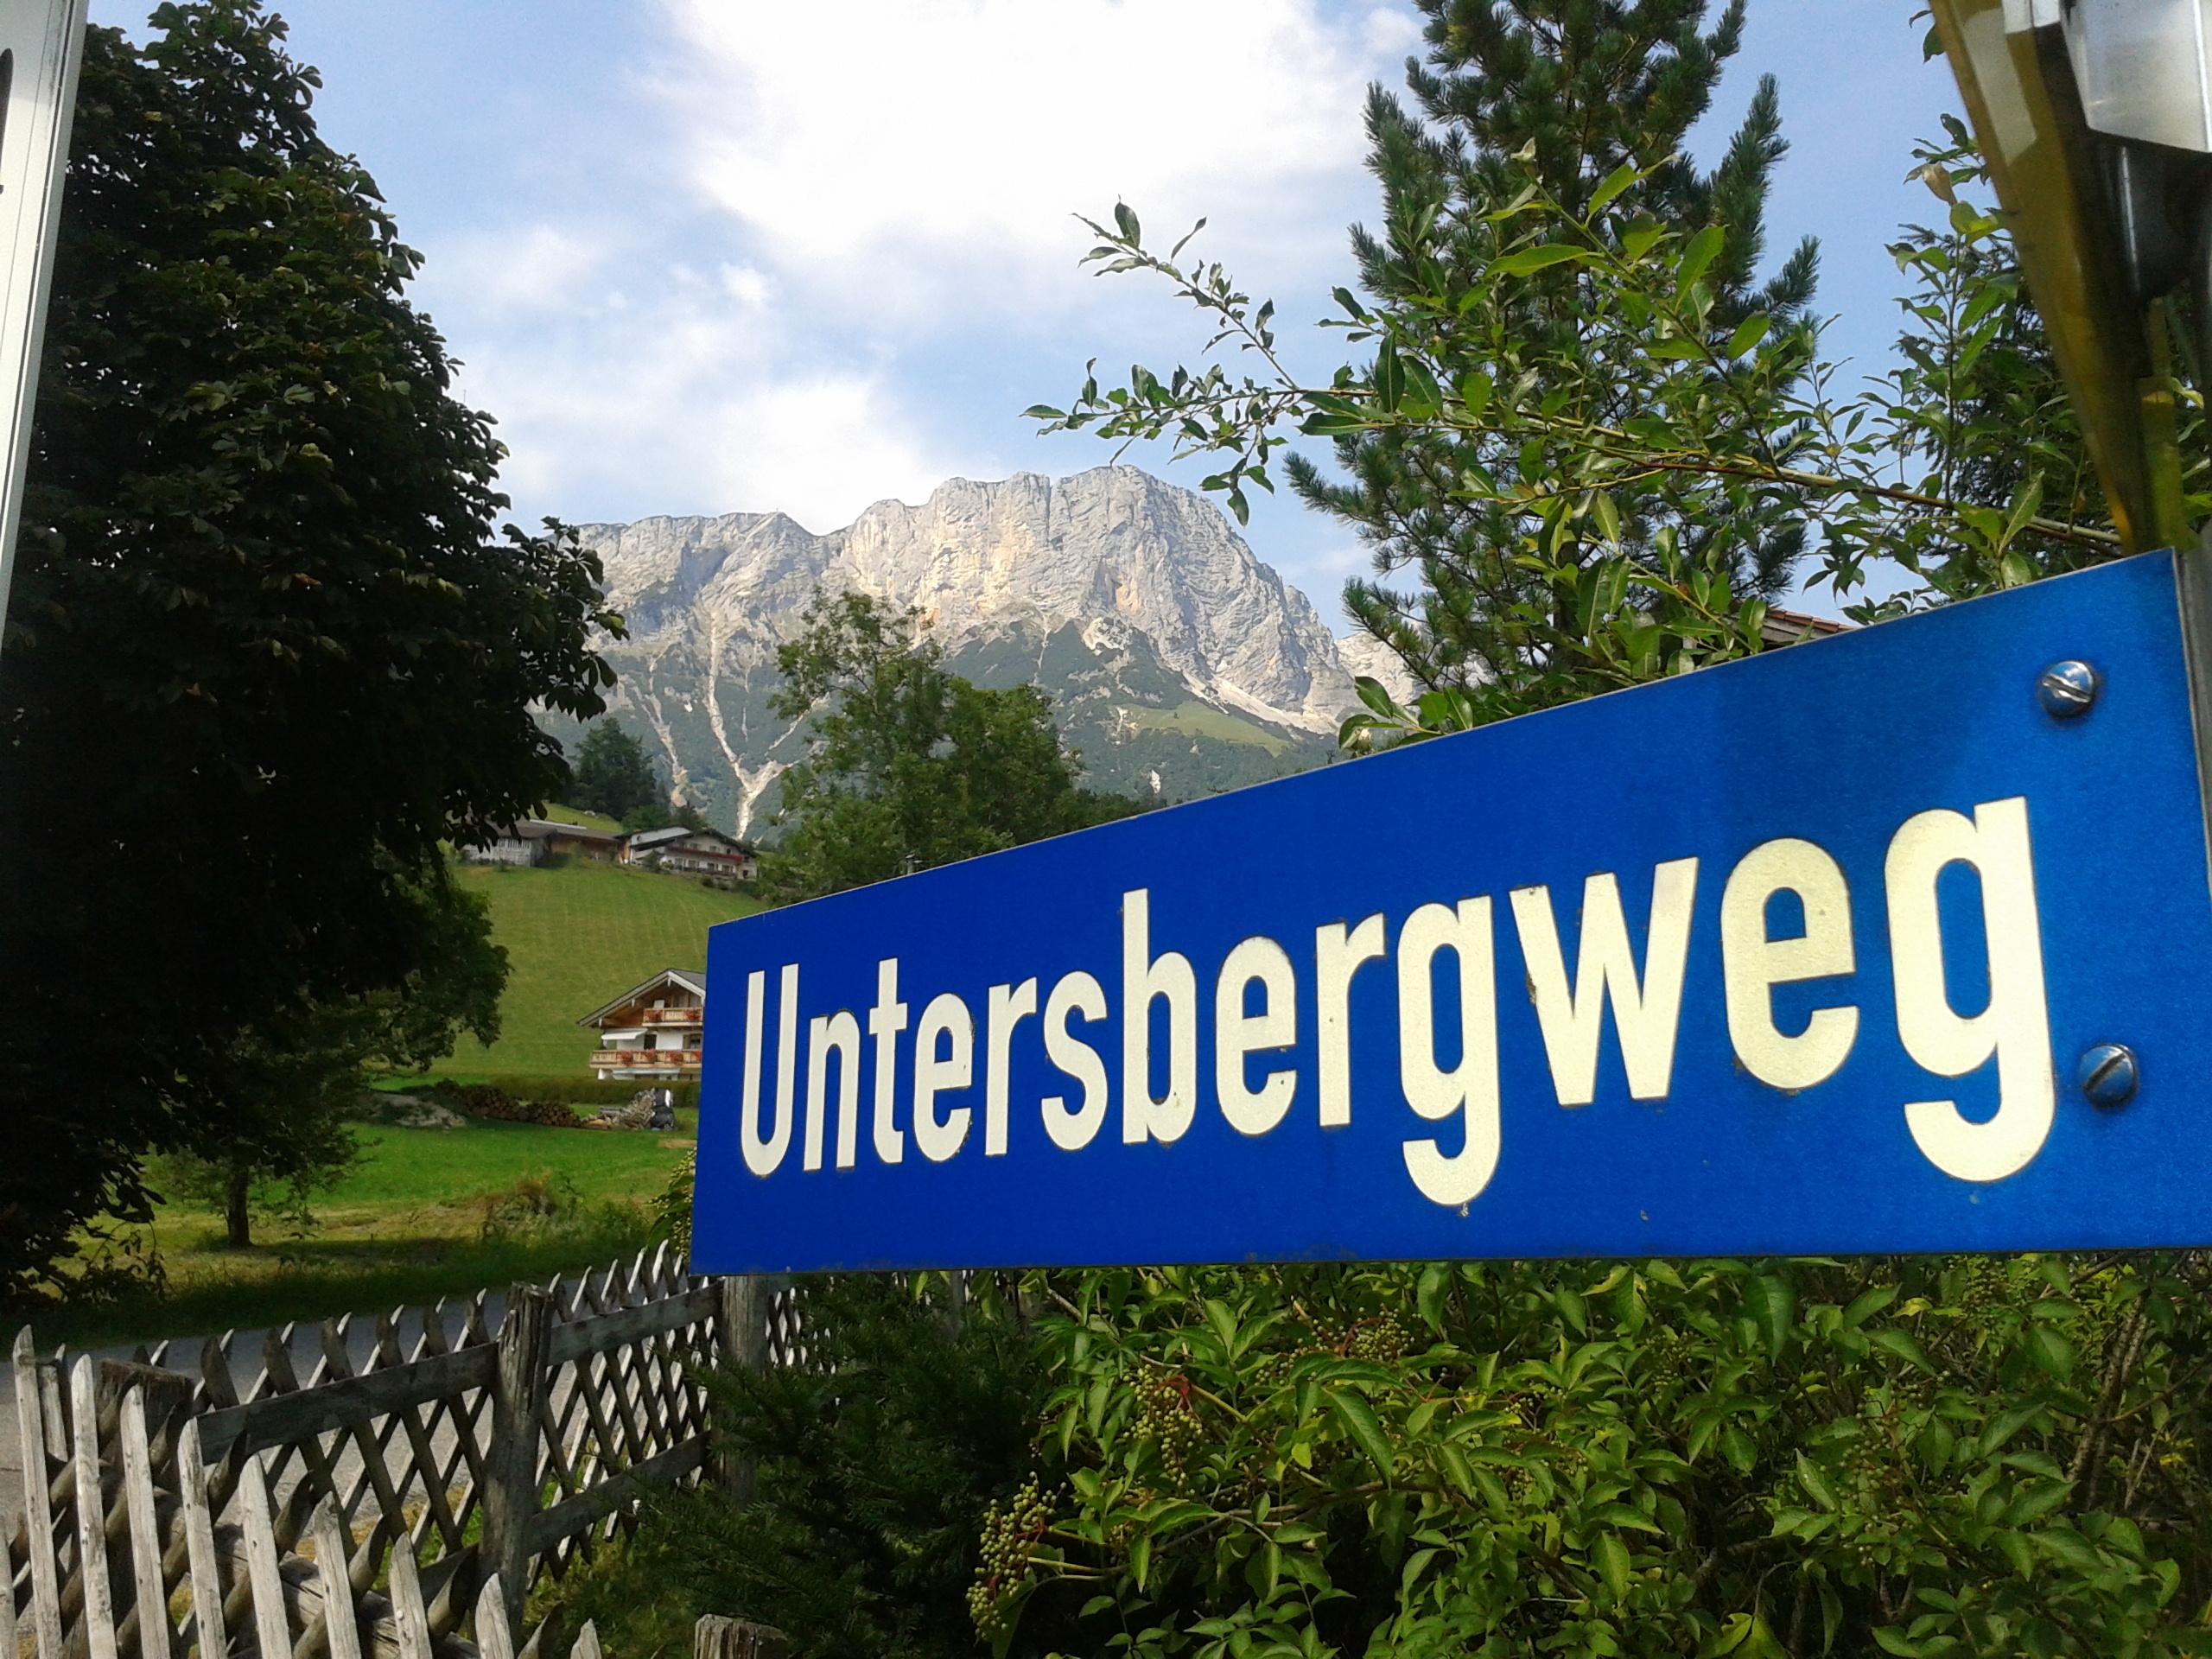 Untersberg  |  Aug 14  | No. 6